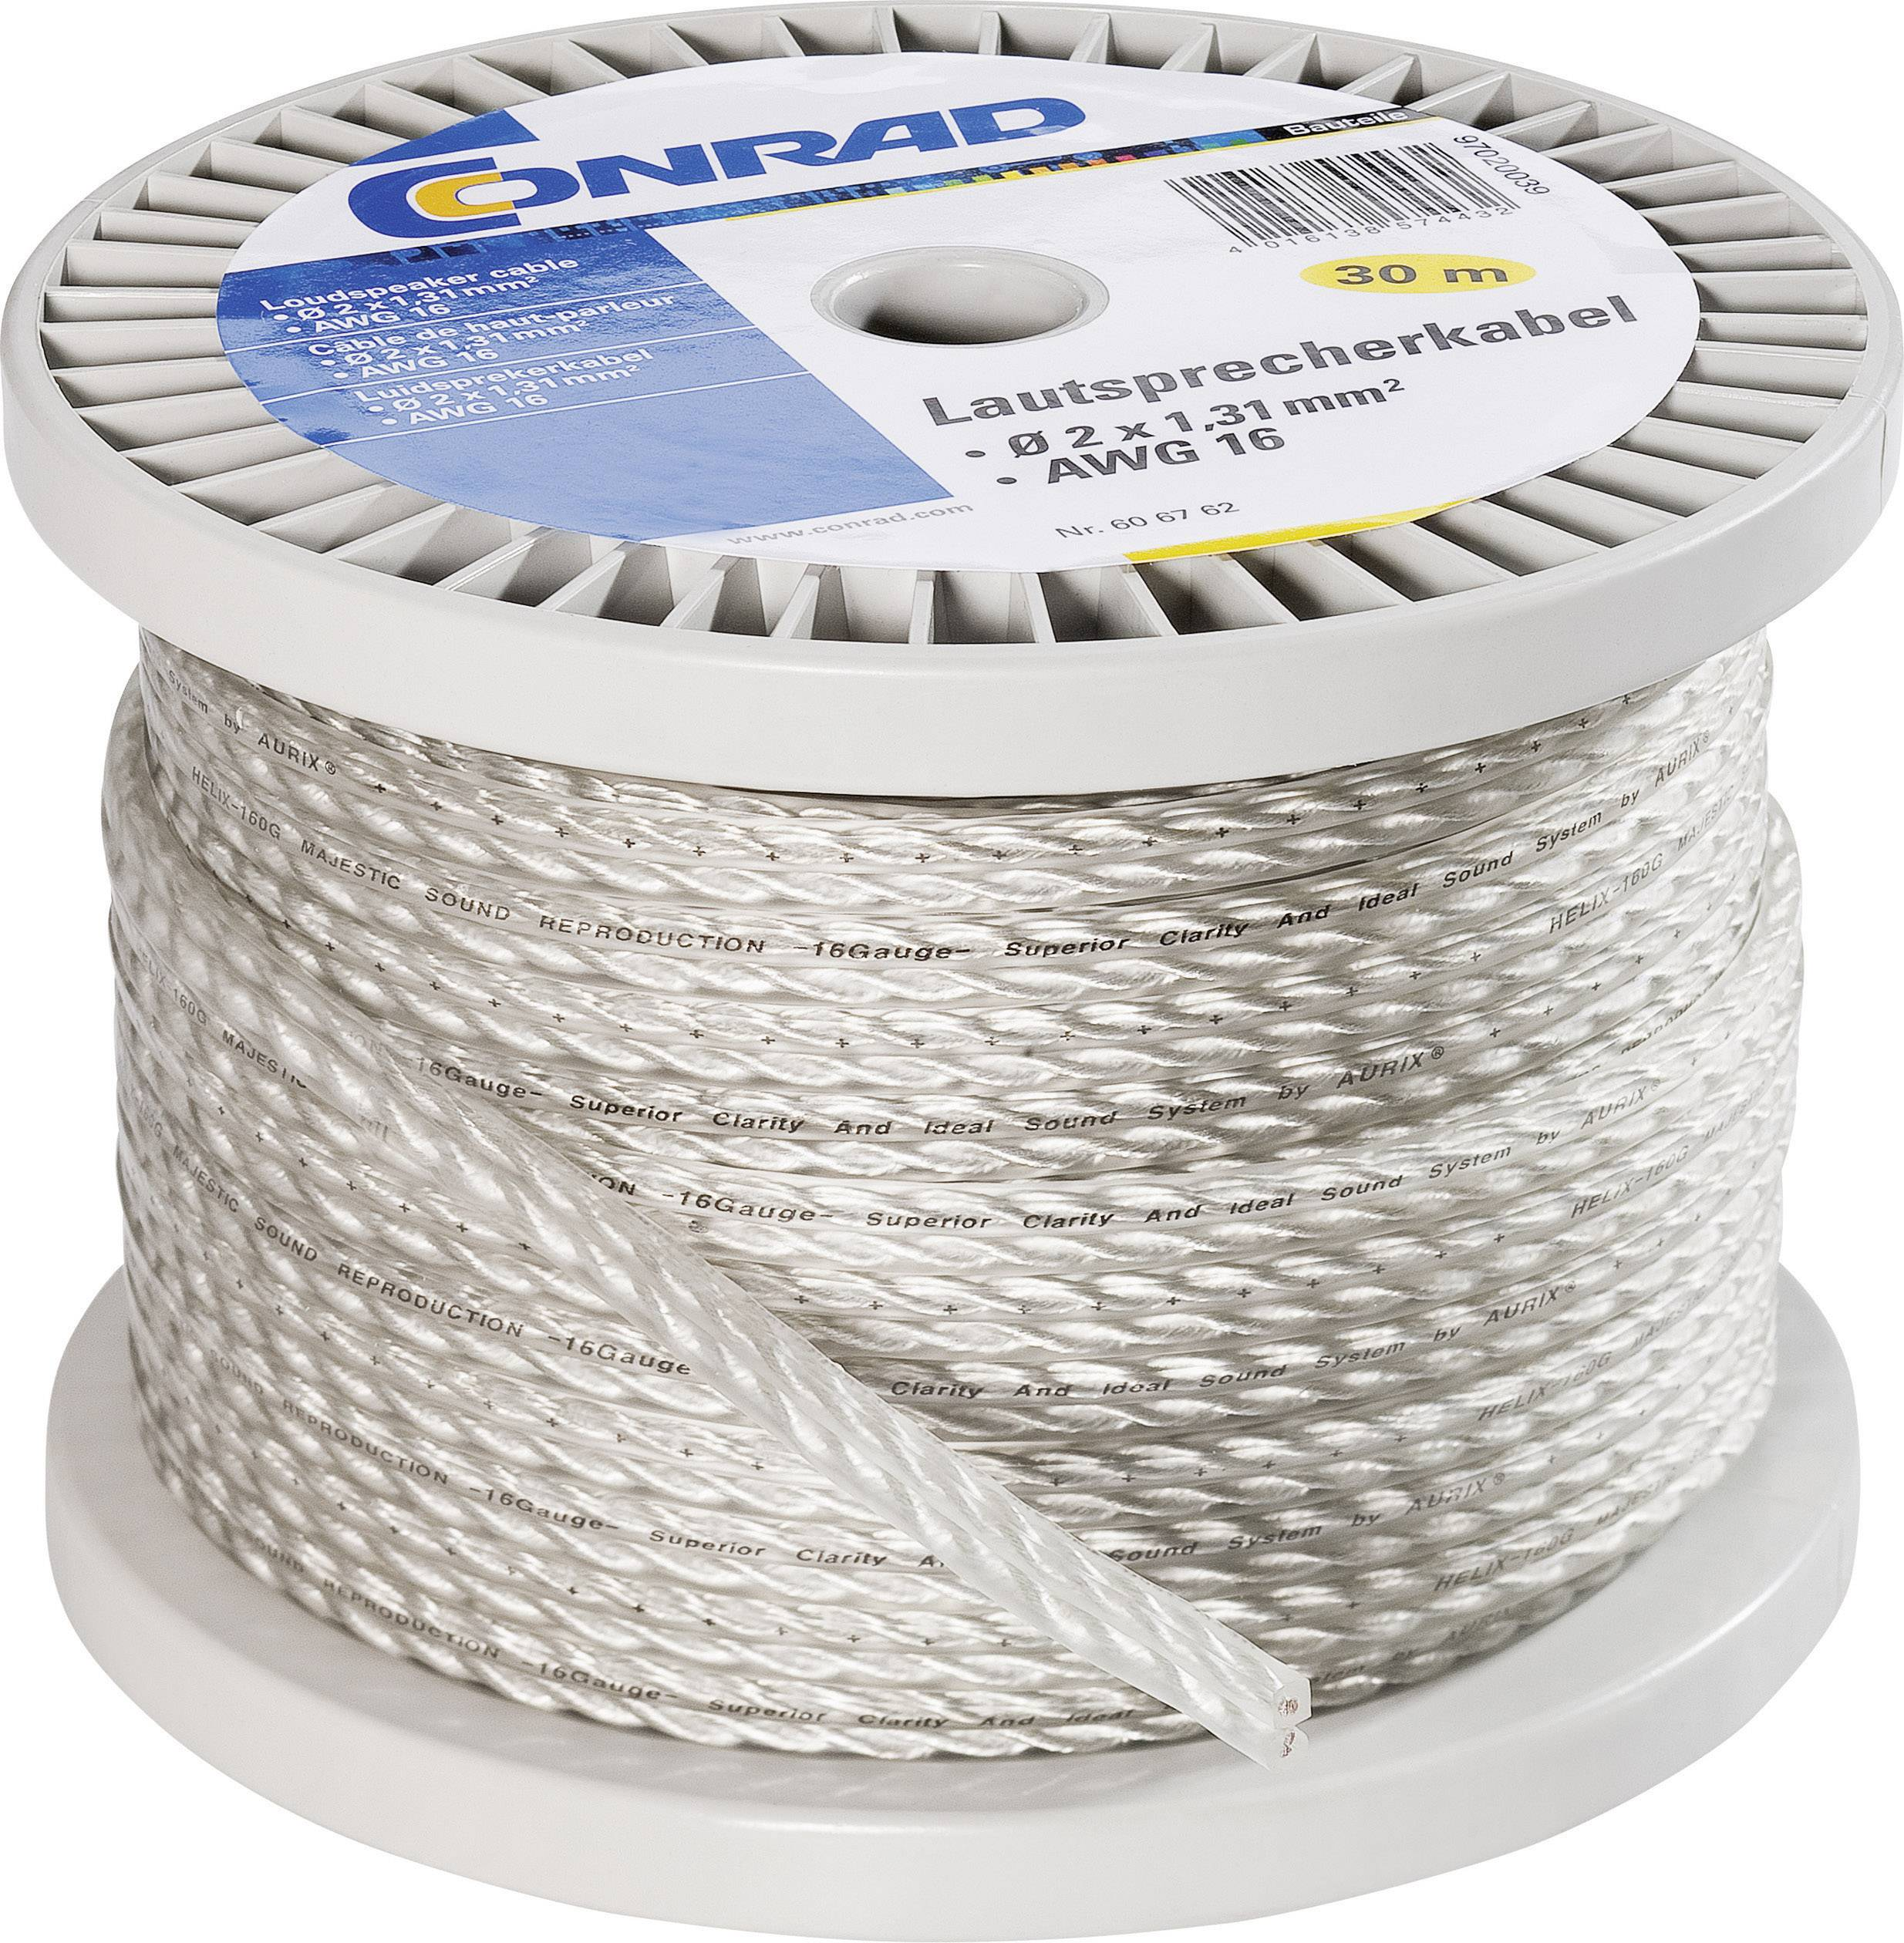 Reproduktorový kabel Conrad Components HELIX-160G, 2 x 1.31 mm², transparentní, 30 m